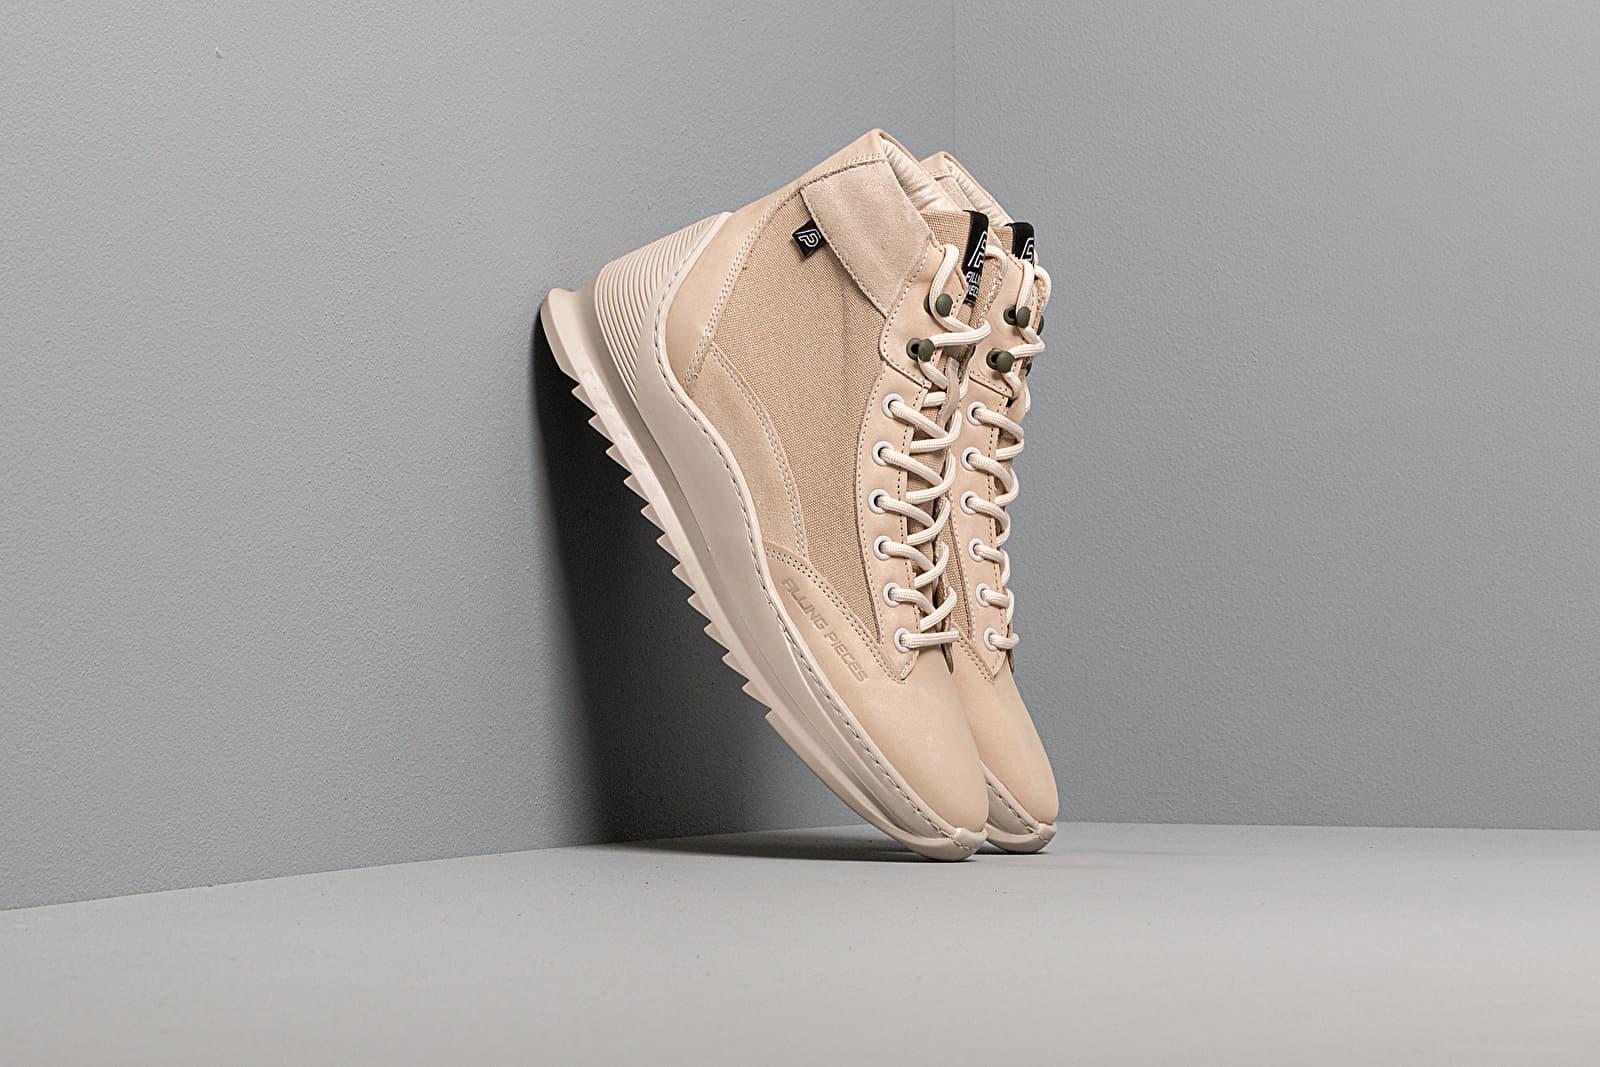 Chaussures et baskets homme Filling Pieces Mid Apline Heel Cap Aten Off White